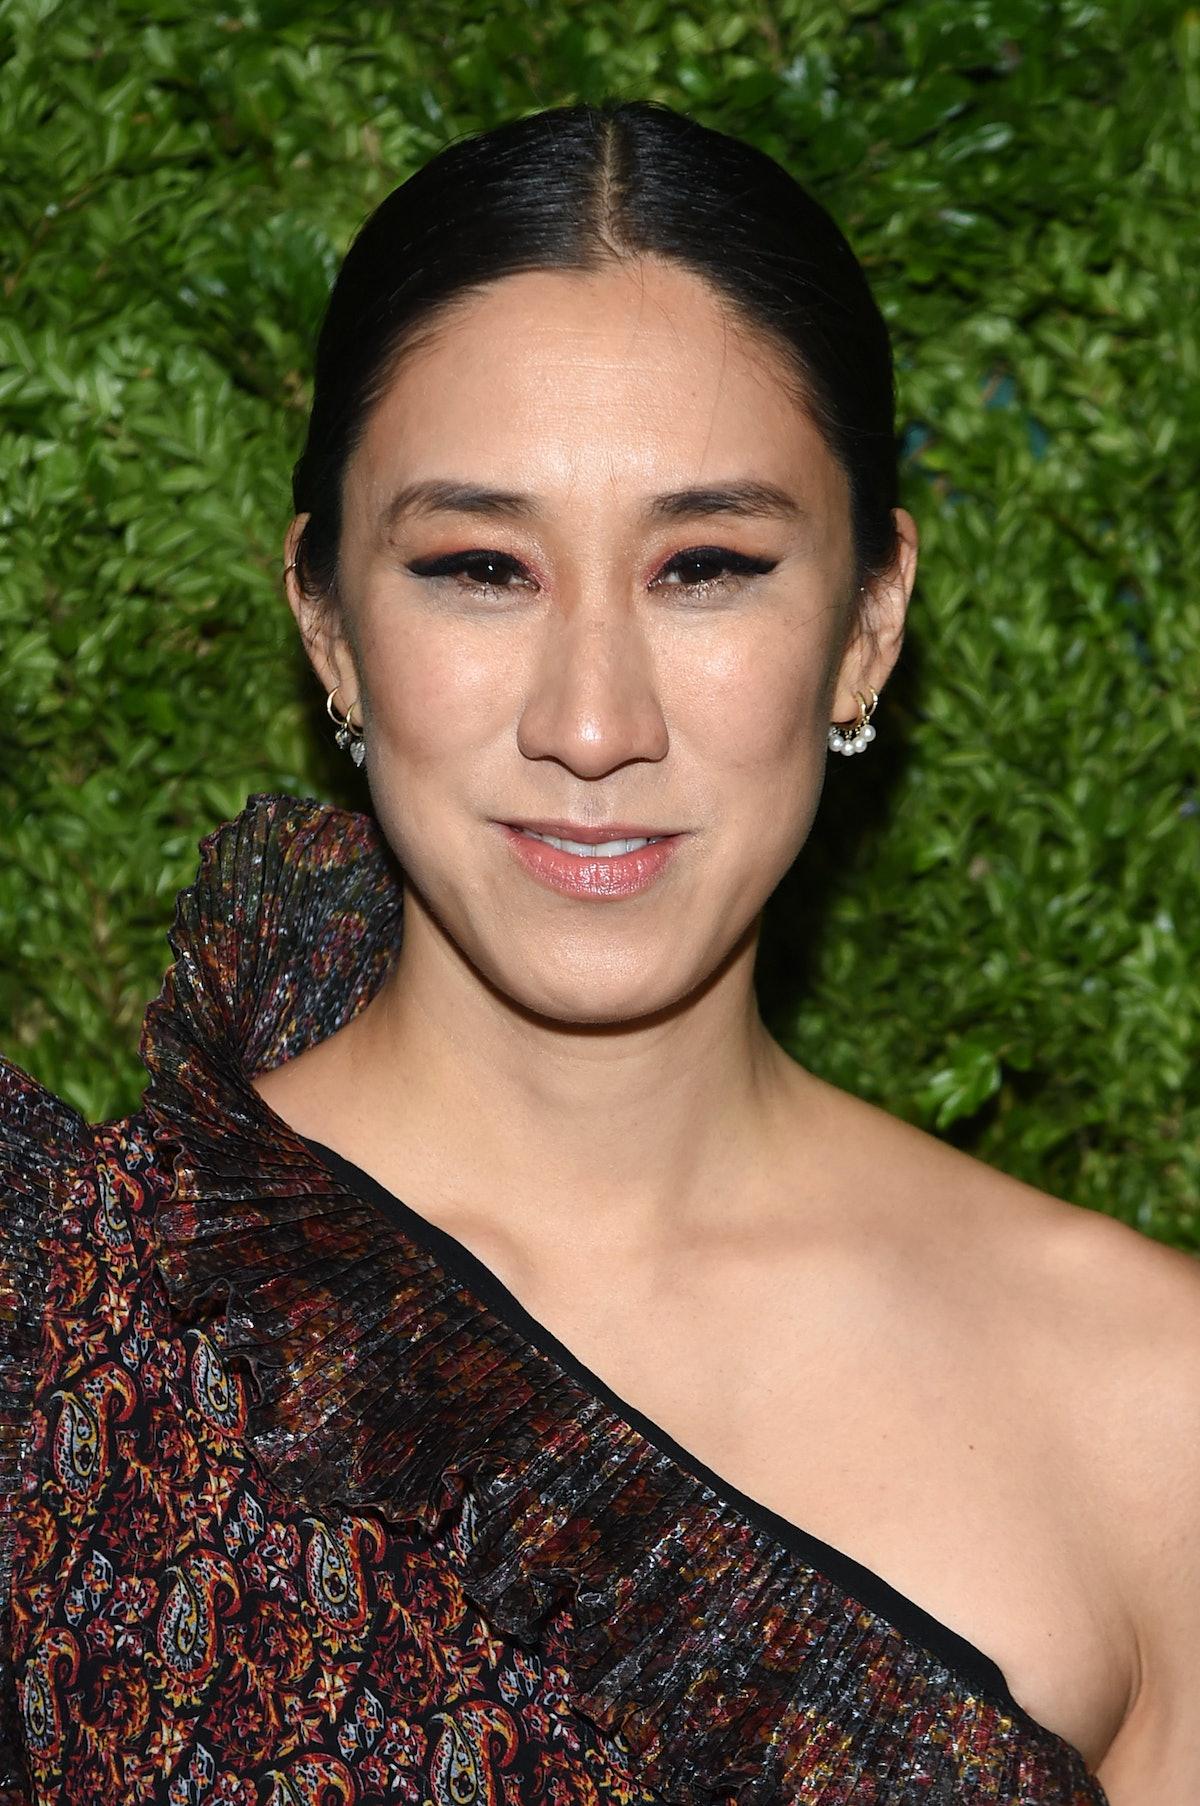 NEW YORK, NEW YORK - NOVEMBER 04: Eva Chen attends the CFDA / Vogue Fashion Fund 2019 Awards at Cipr...